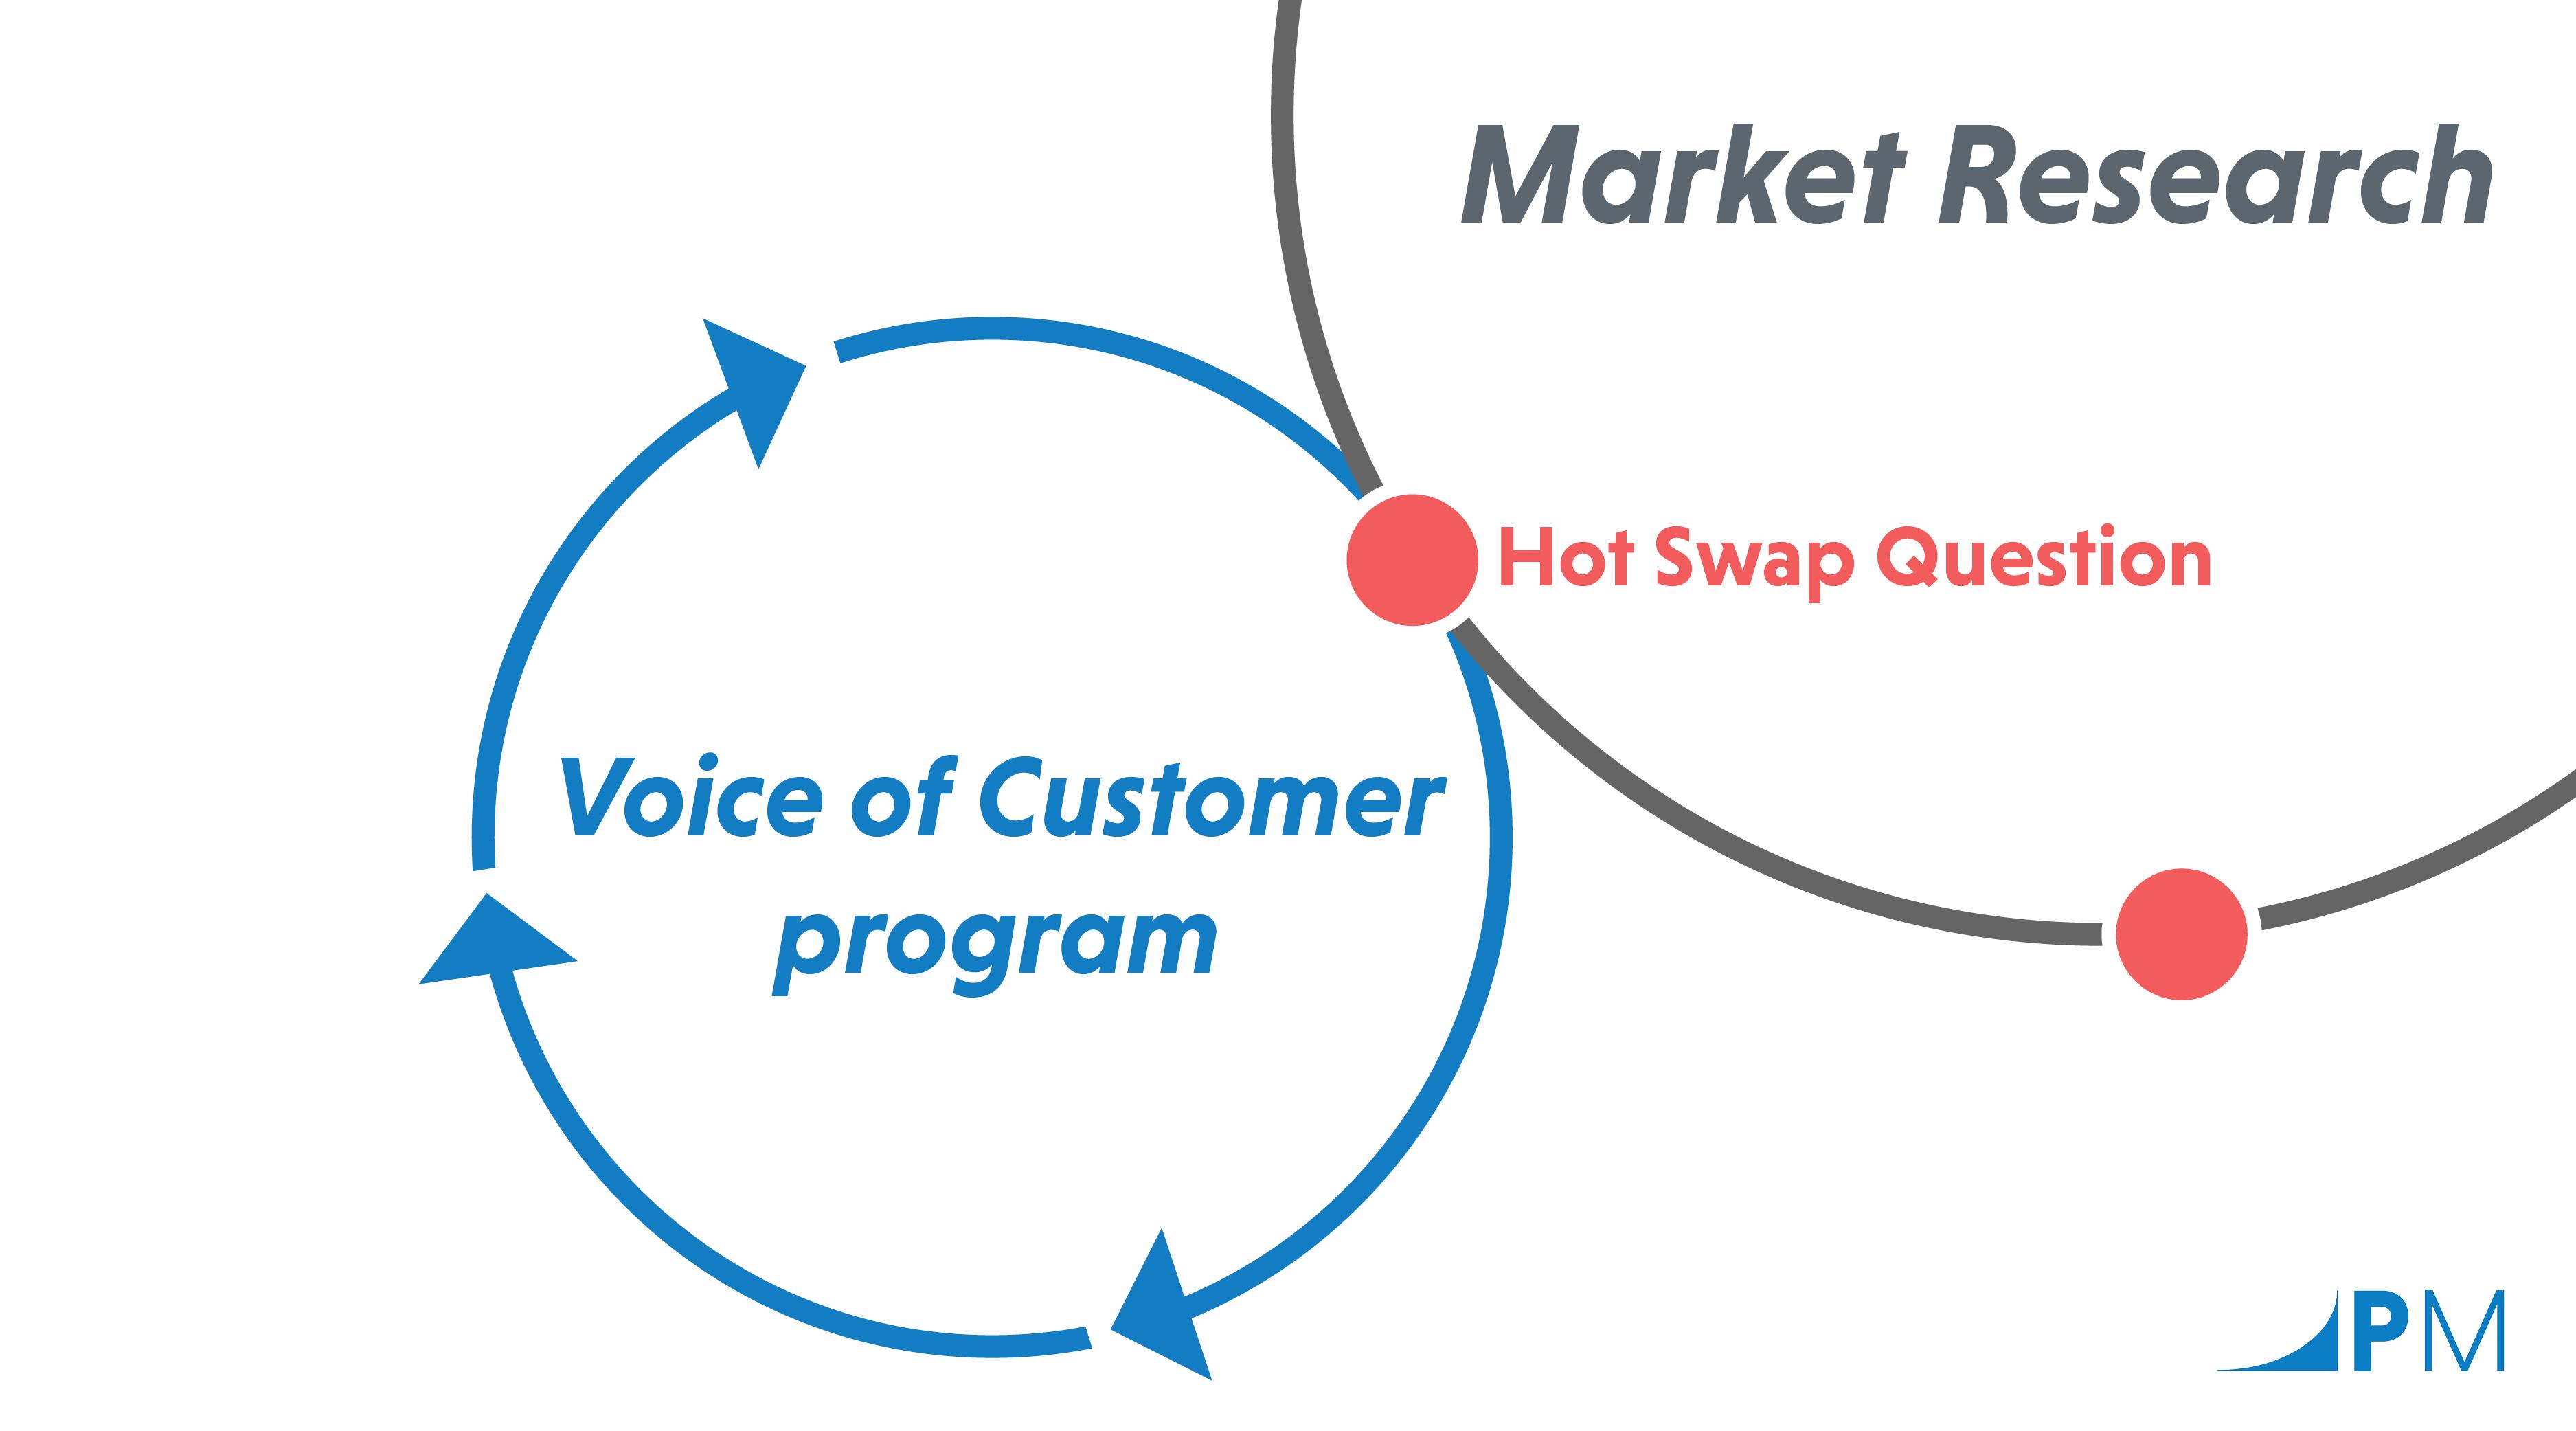 The PeopleMetrics Hot Swap model